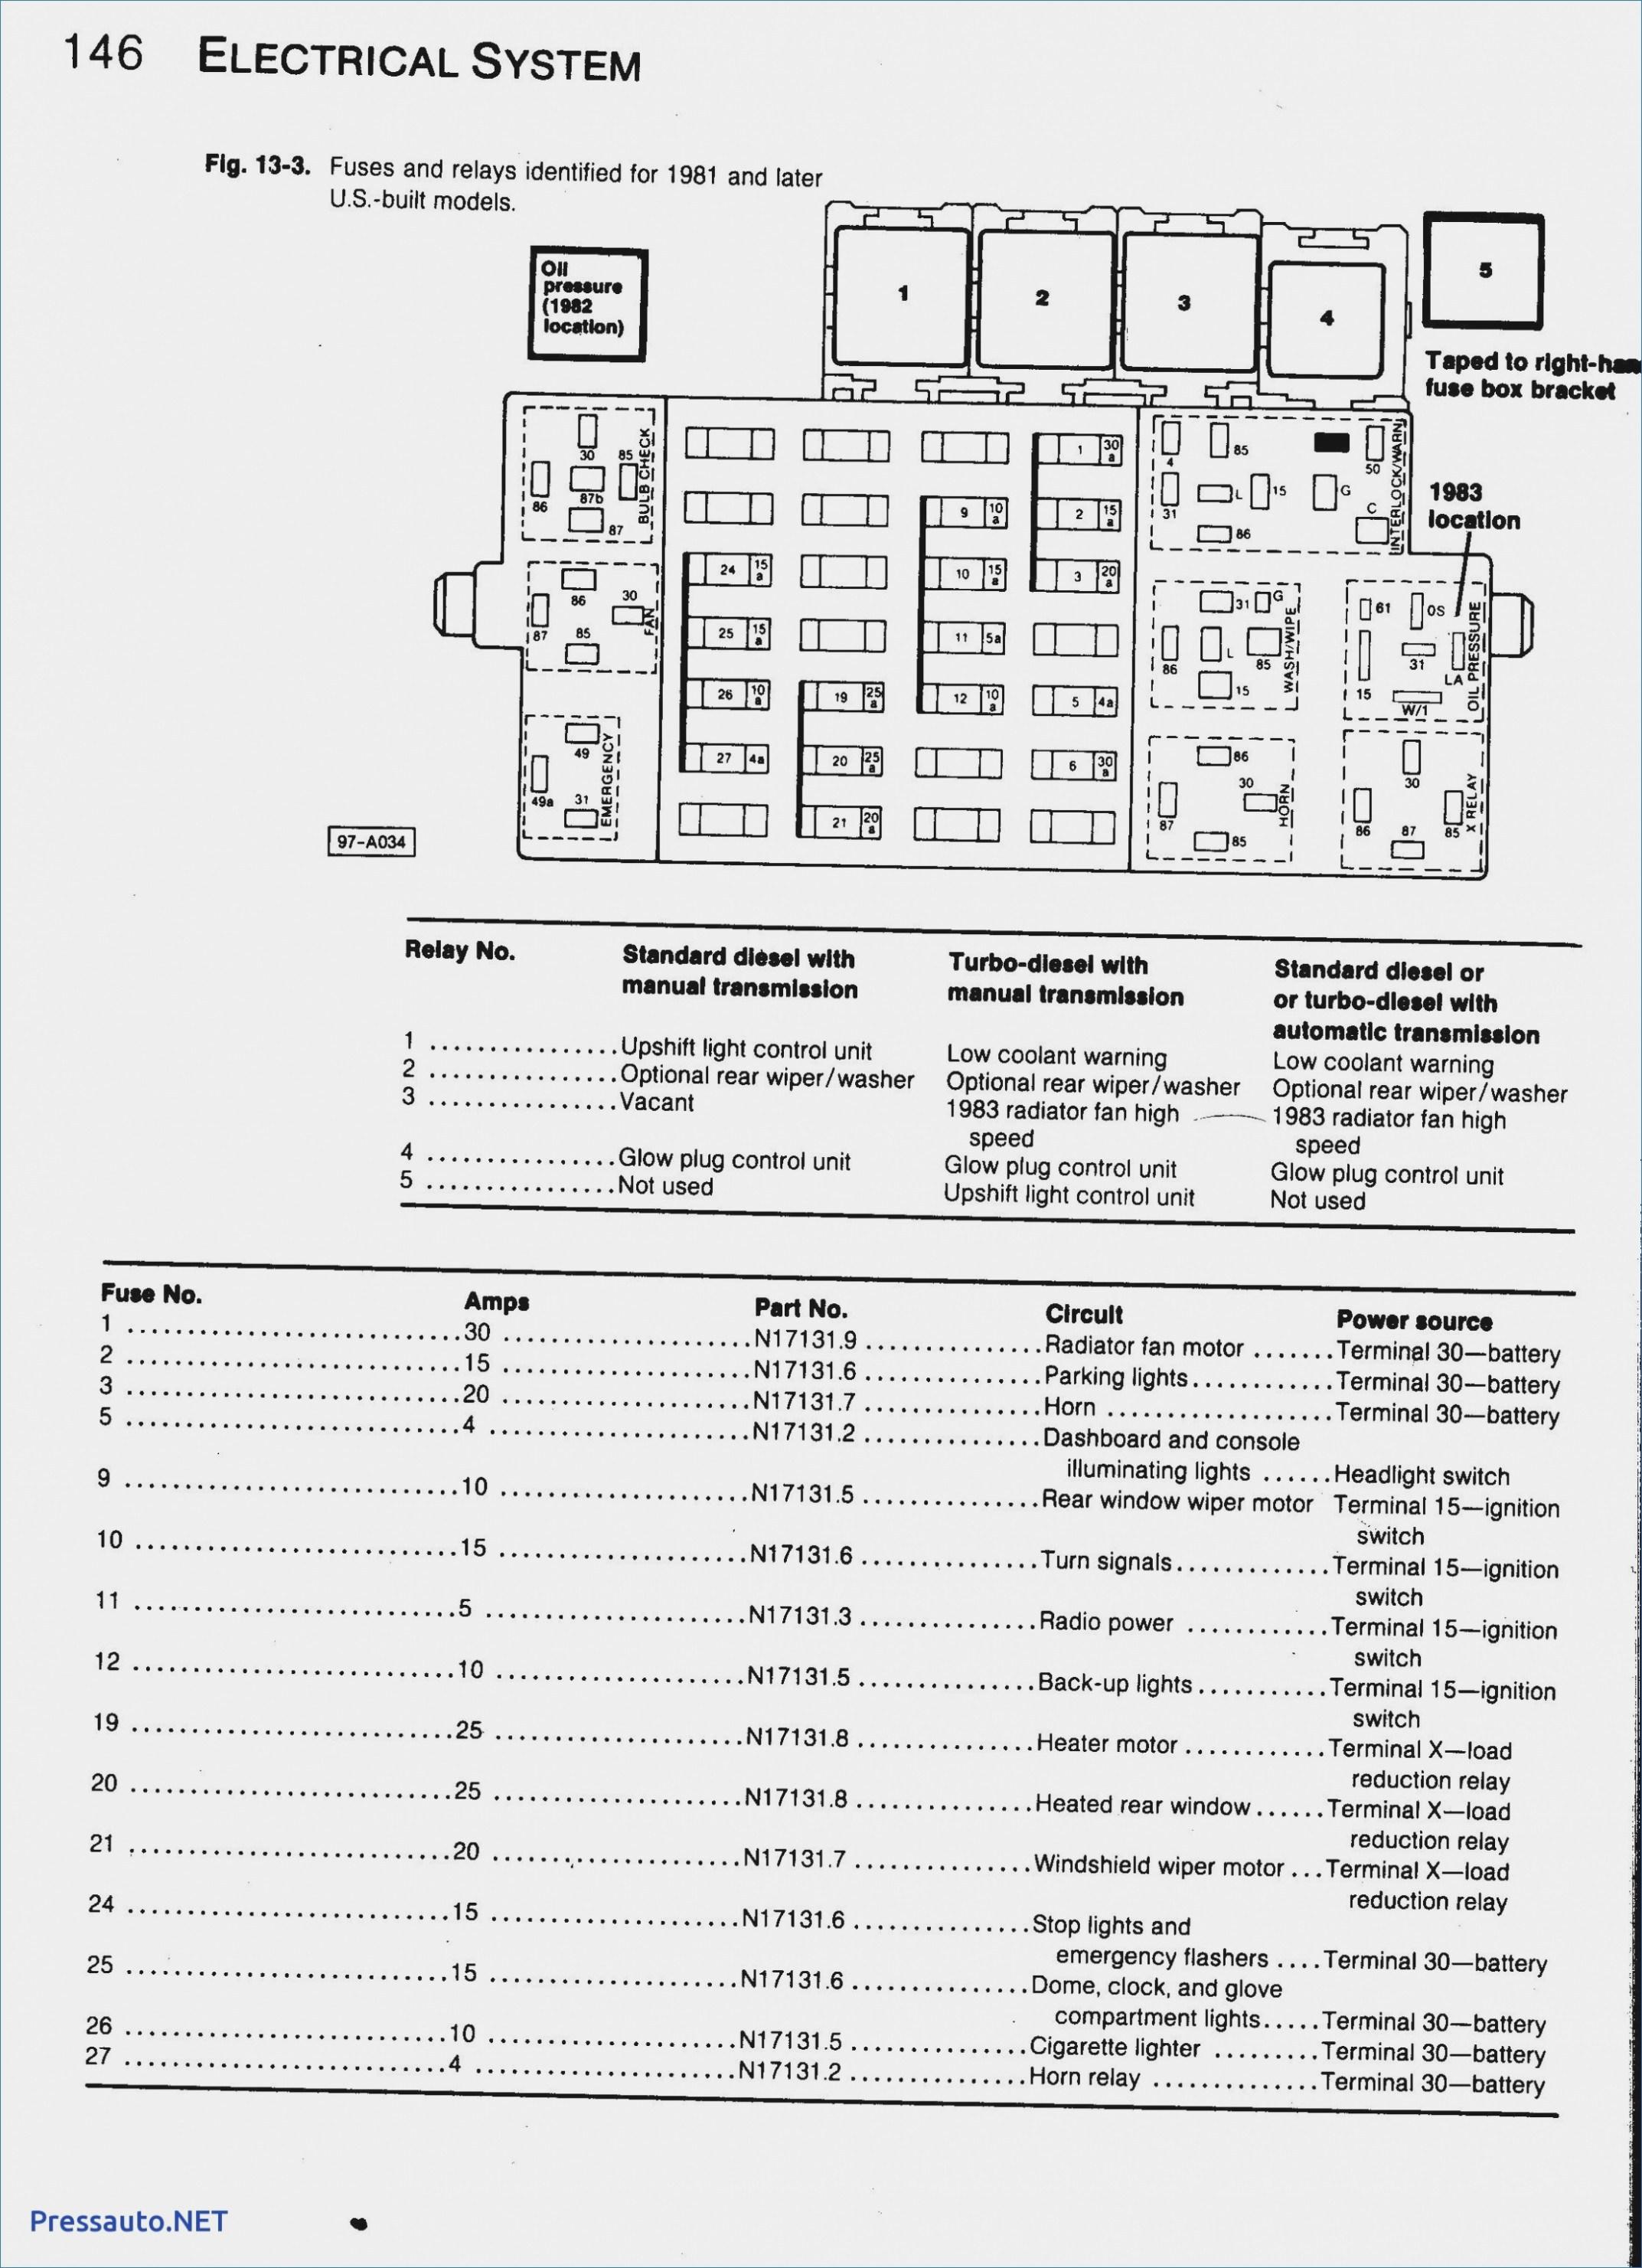 NS_4283] Vw Jetta Wiring Diagram In Addition 1997 Vw Jetta Fuse Diagram OnCosm Wigeg Mohammedshrine Librar Wiring 101